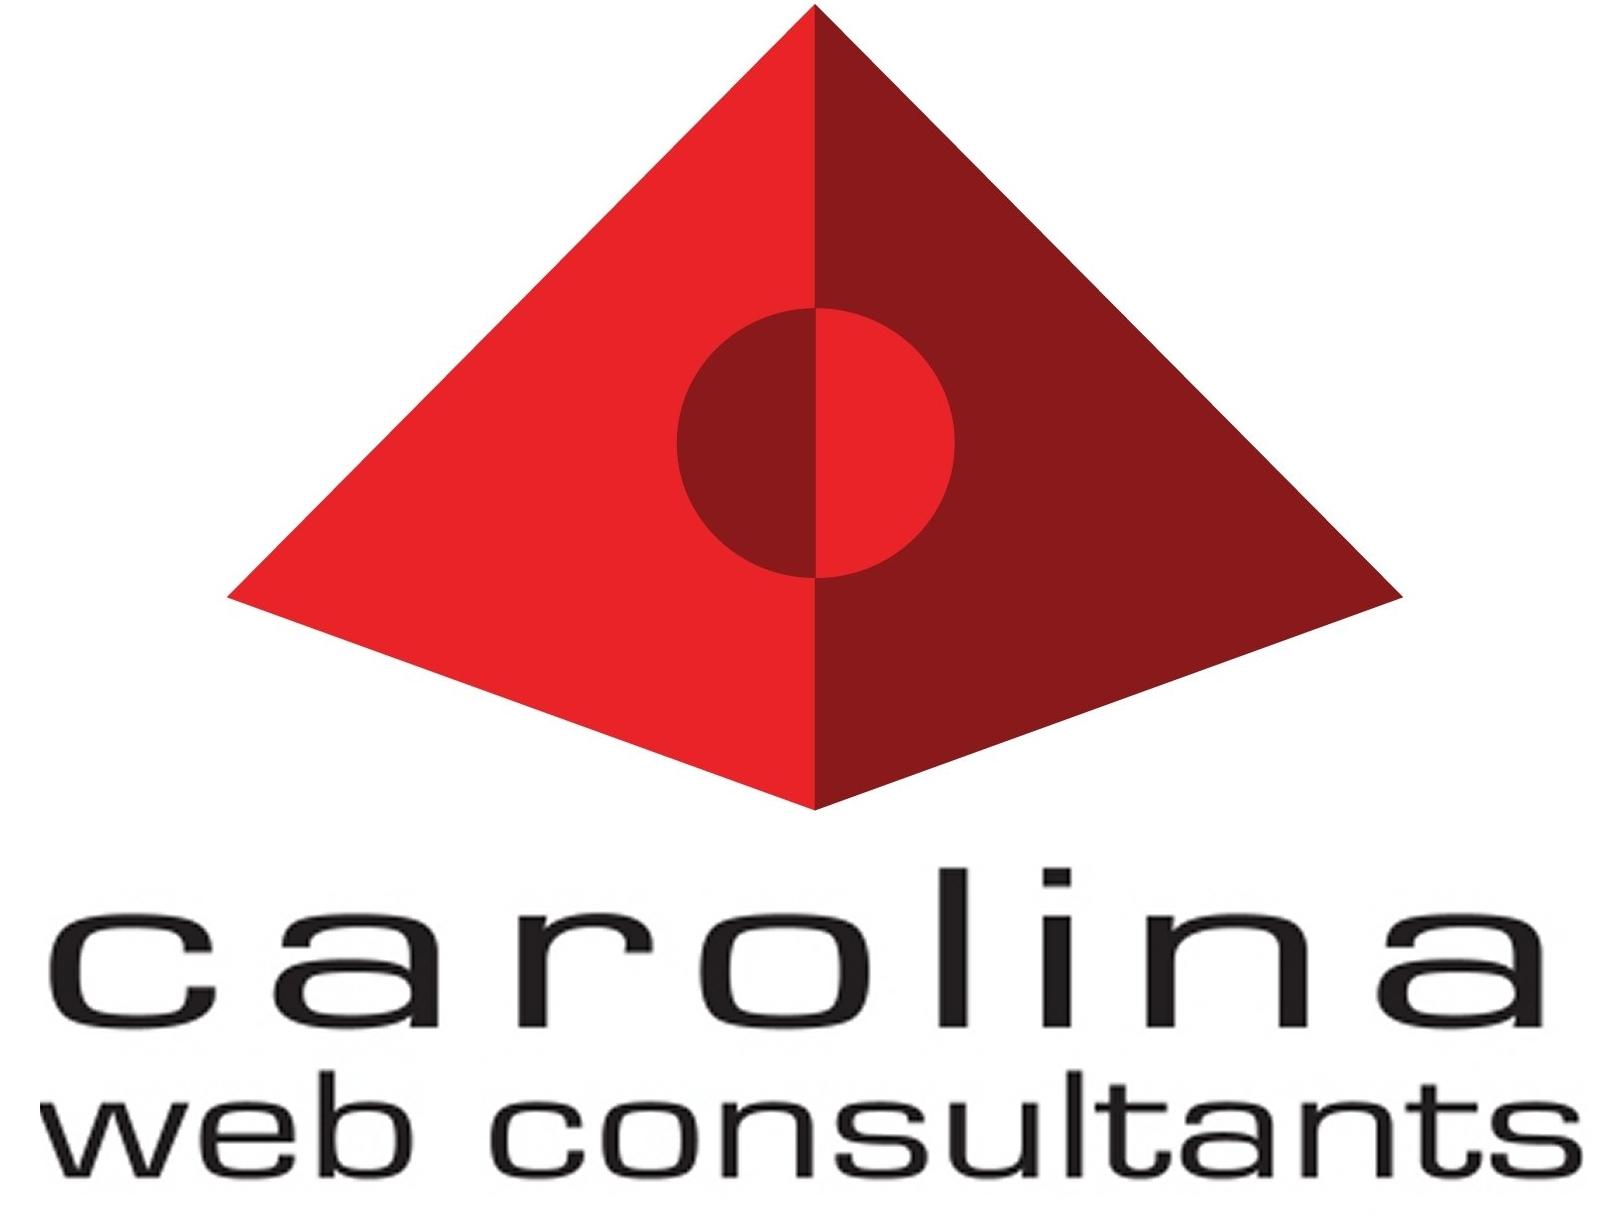 Carolina Web Consultants Inc